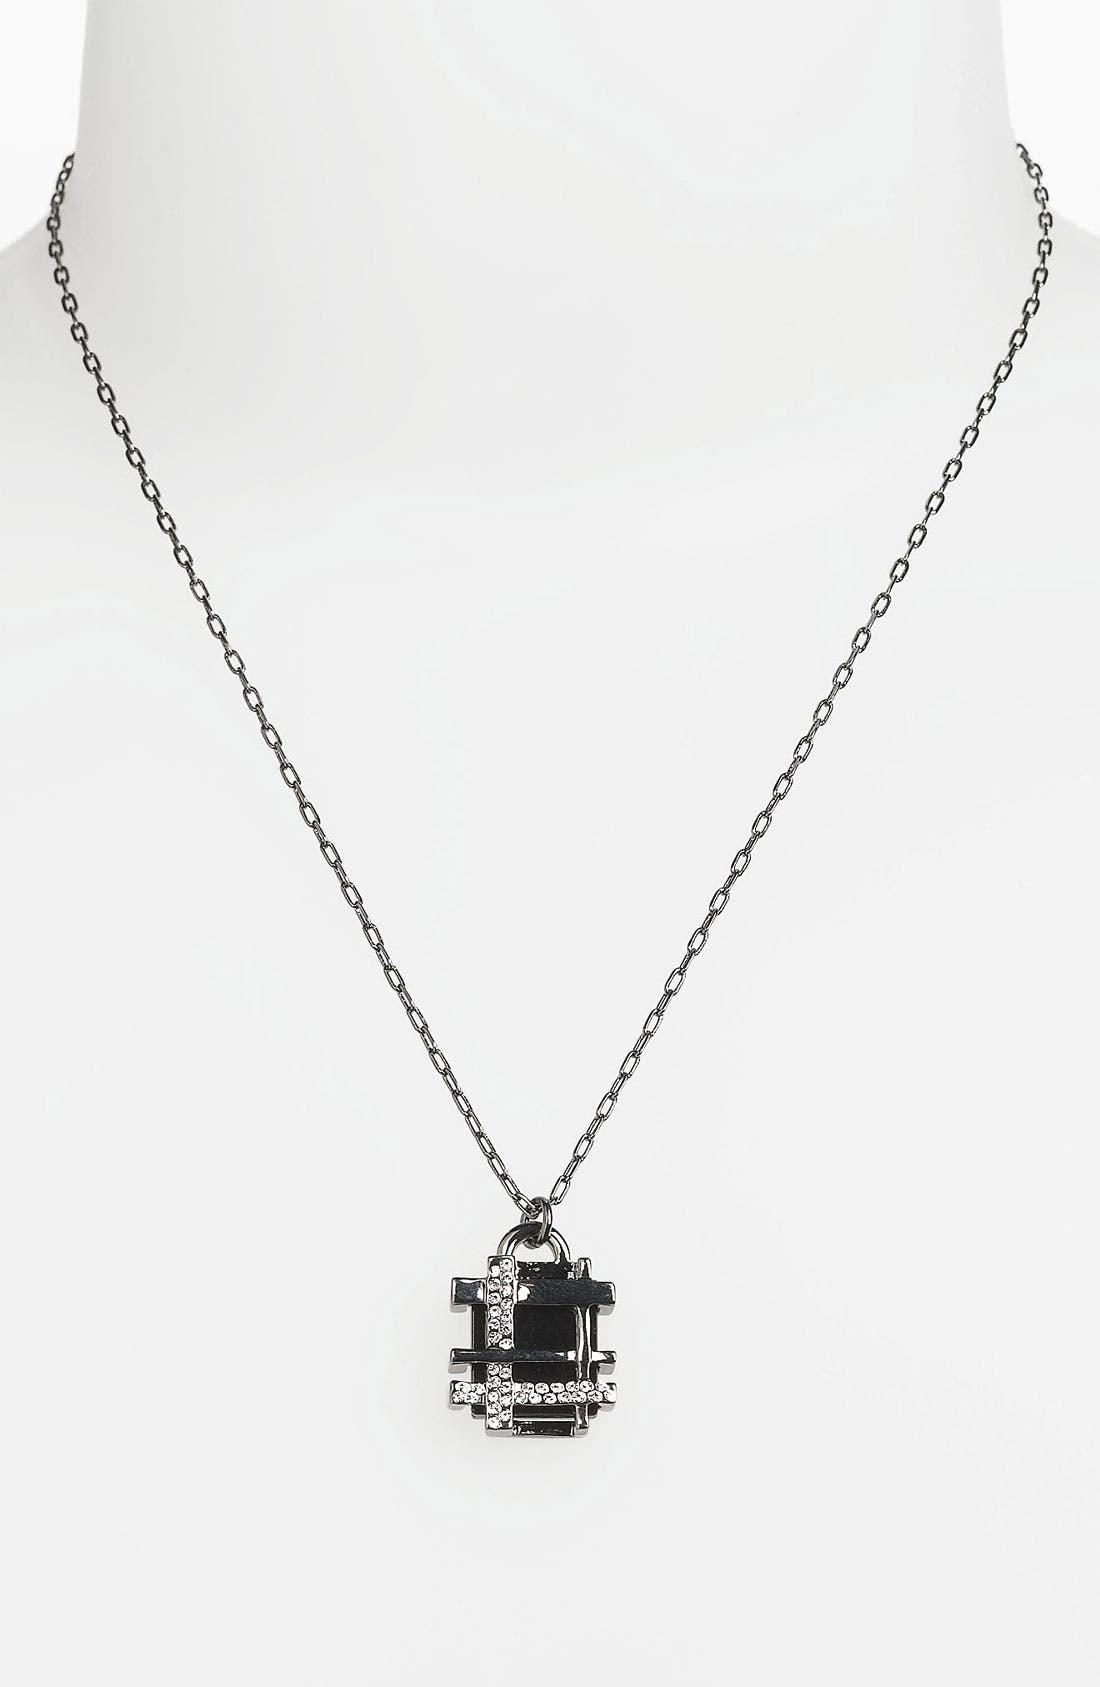 Main Image - Tory Burch 'Mini' Pendant Necklace